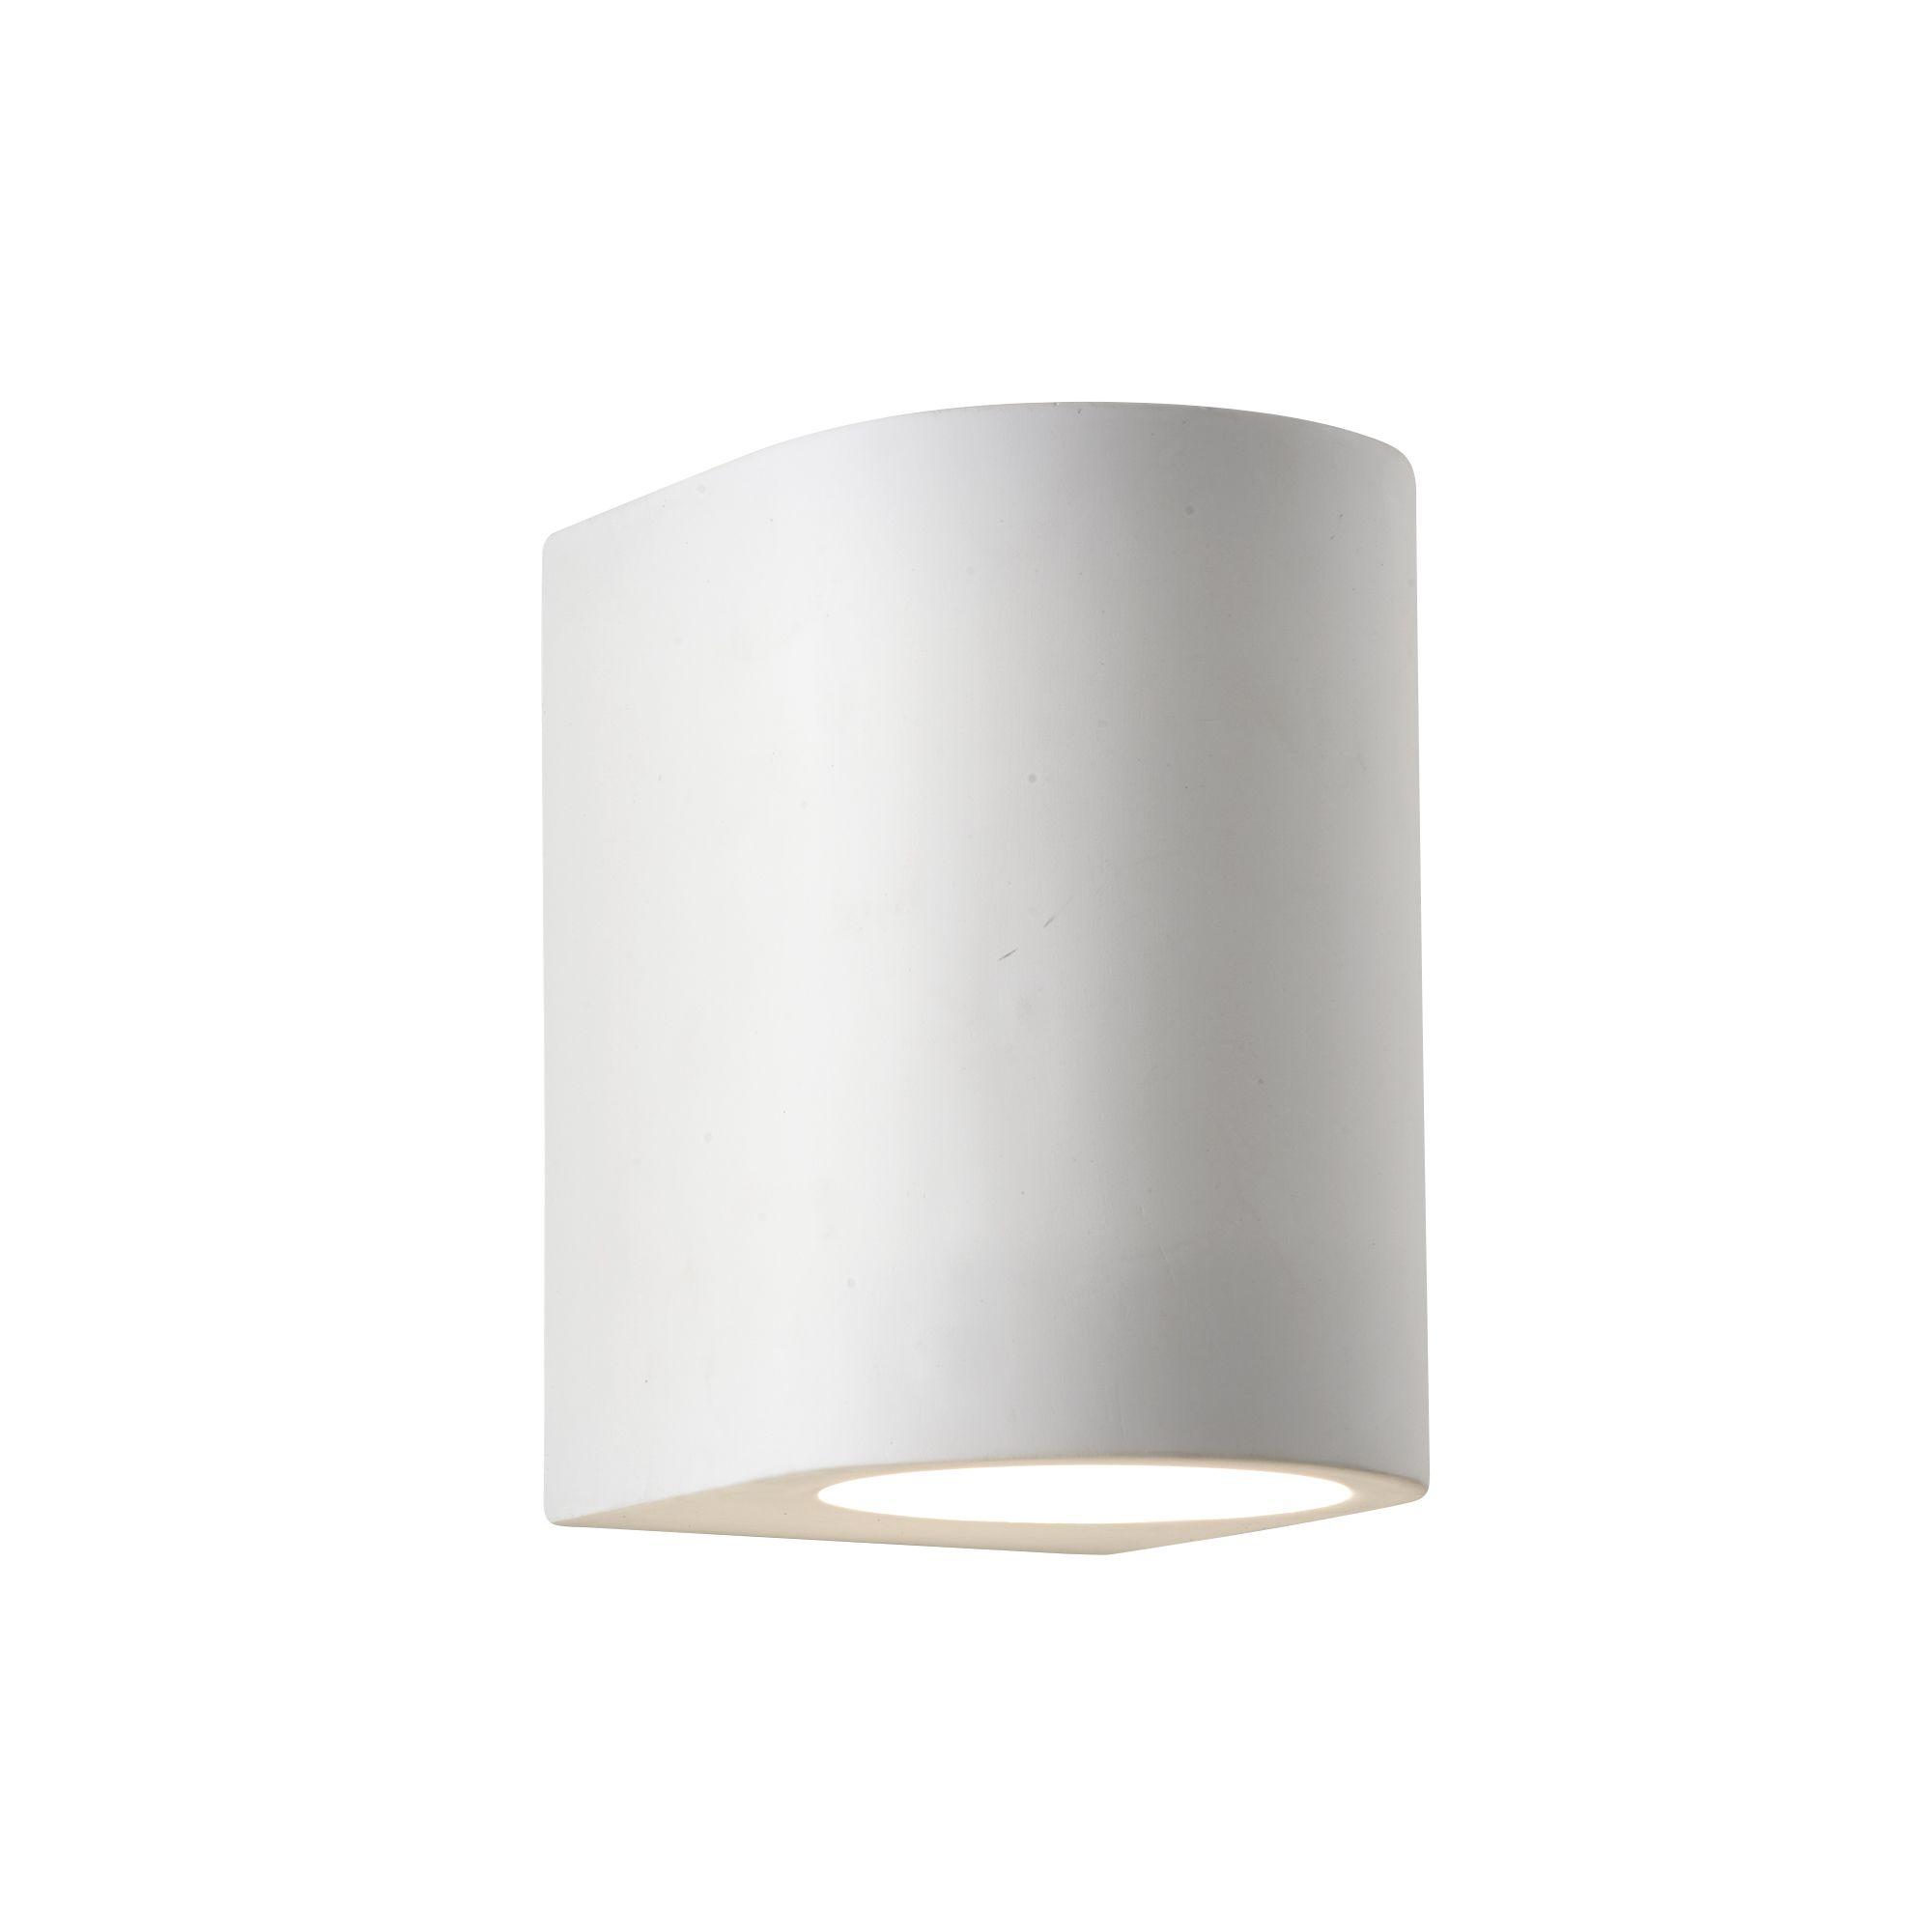 Searchlight Gypsum 8436 fali lámpa